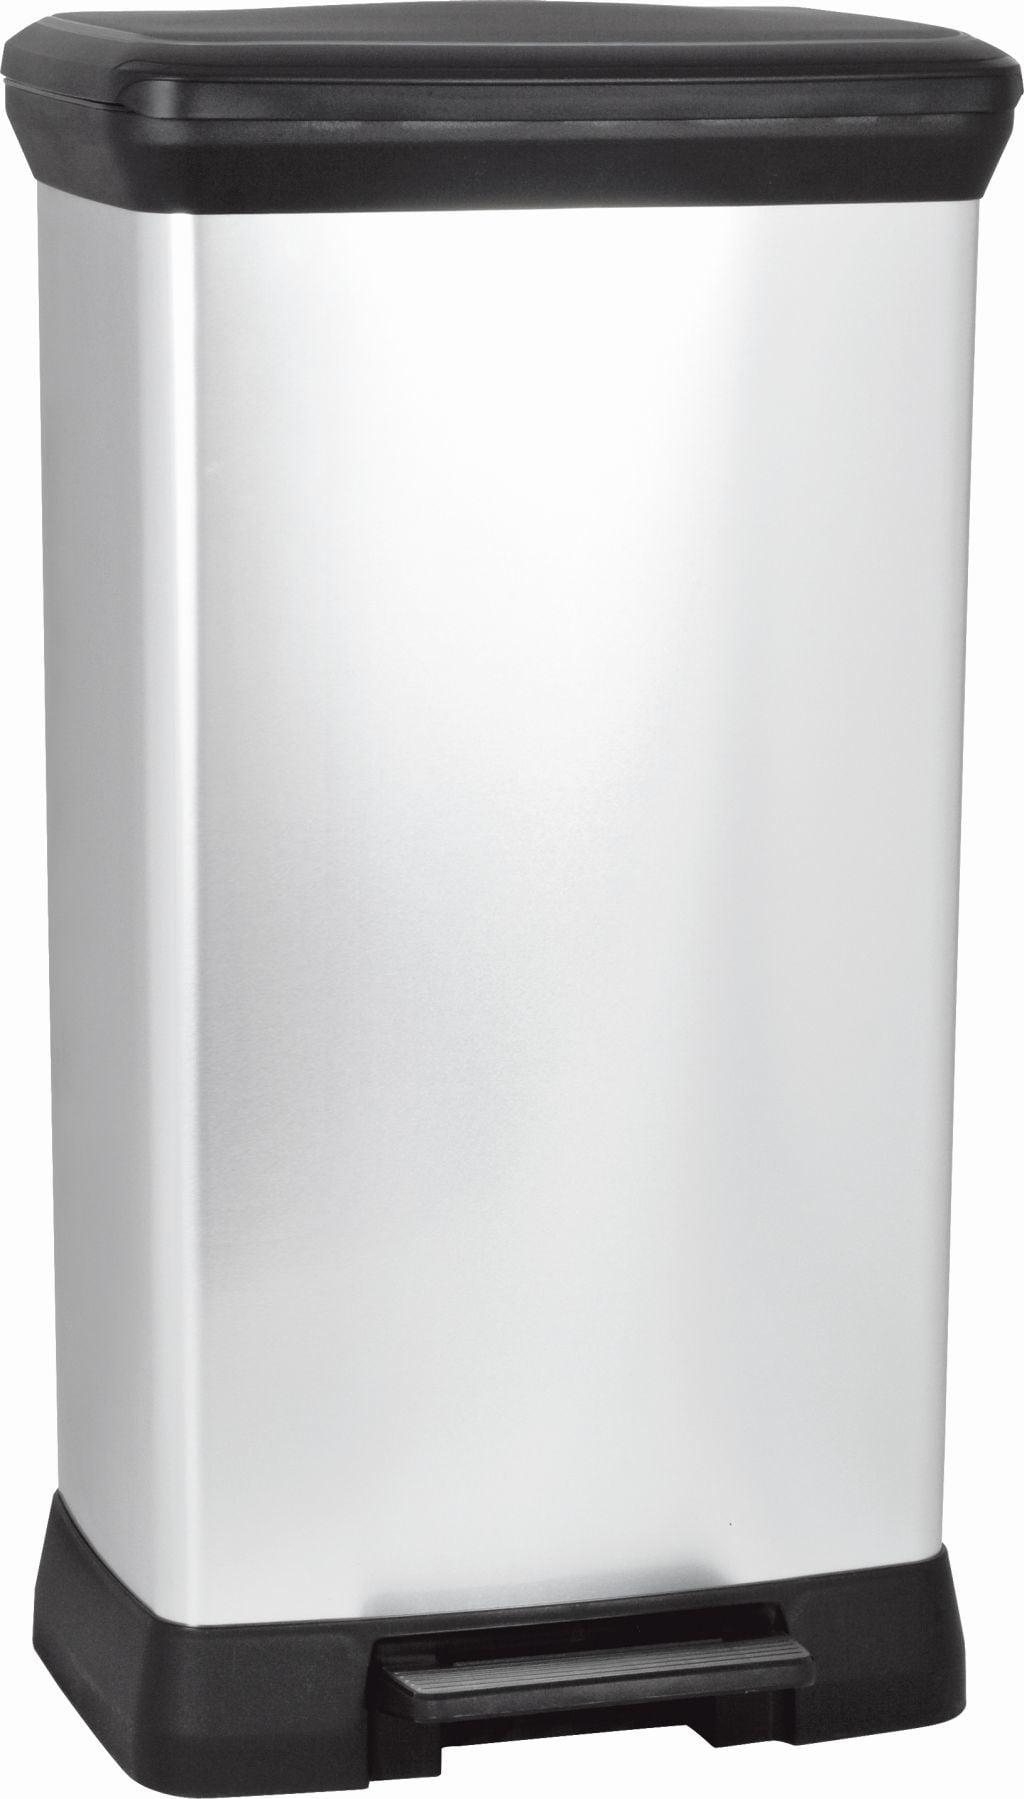 Curver Decobin Pedaalemmer 50 L Zilver Metallic Zwart.Curver Decobin Pedaalemmer 50 Liter Zilver Metallic Zwart In Full Color Box Curver Decobin Pedaalemmer 50 Liter Zilver Metallic Zwart In Full